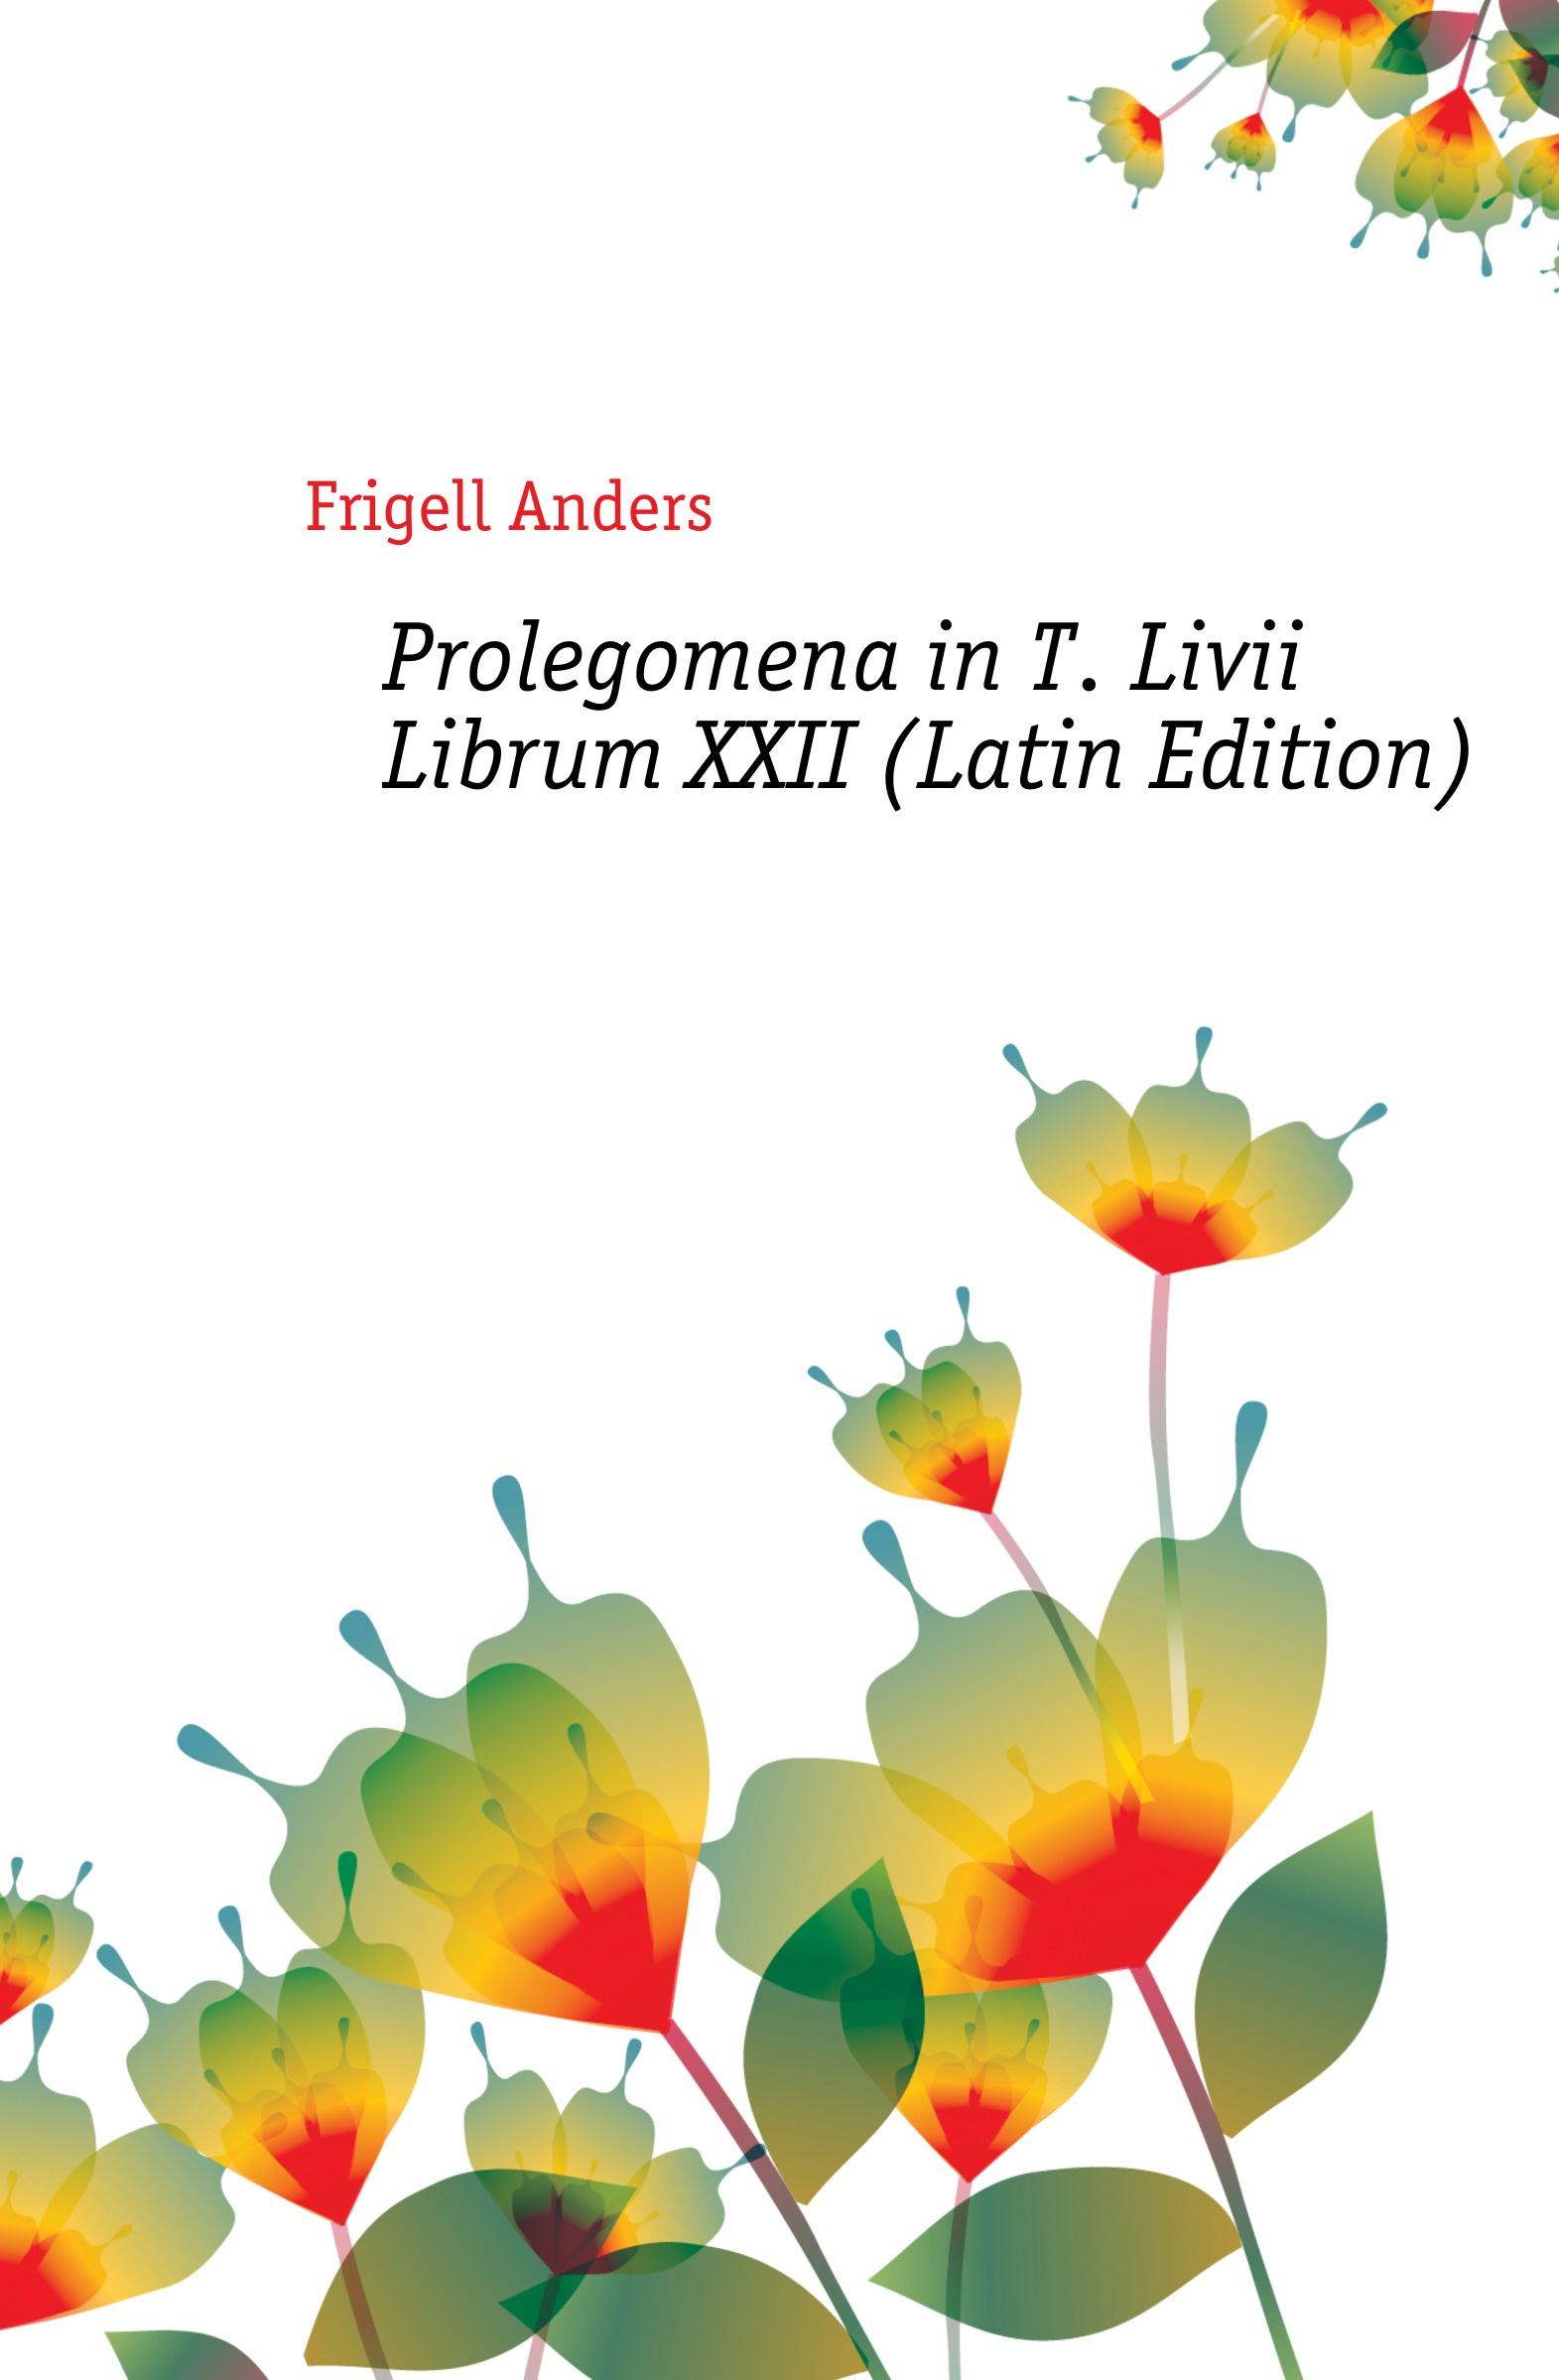 Frigell Anders Prolegomena in T. Livii Librum XXII (Latin Edition) heussner friedrich observationes grammaticae in catulli veronensis librum latin edition